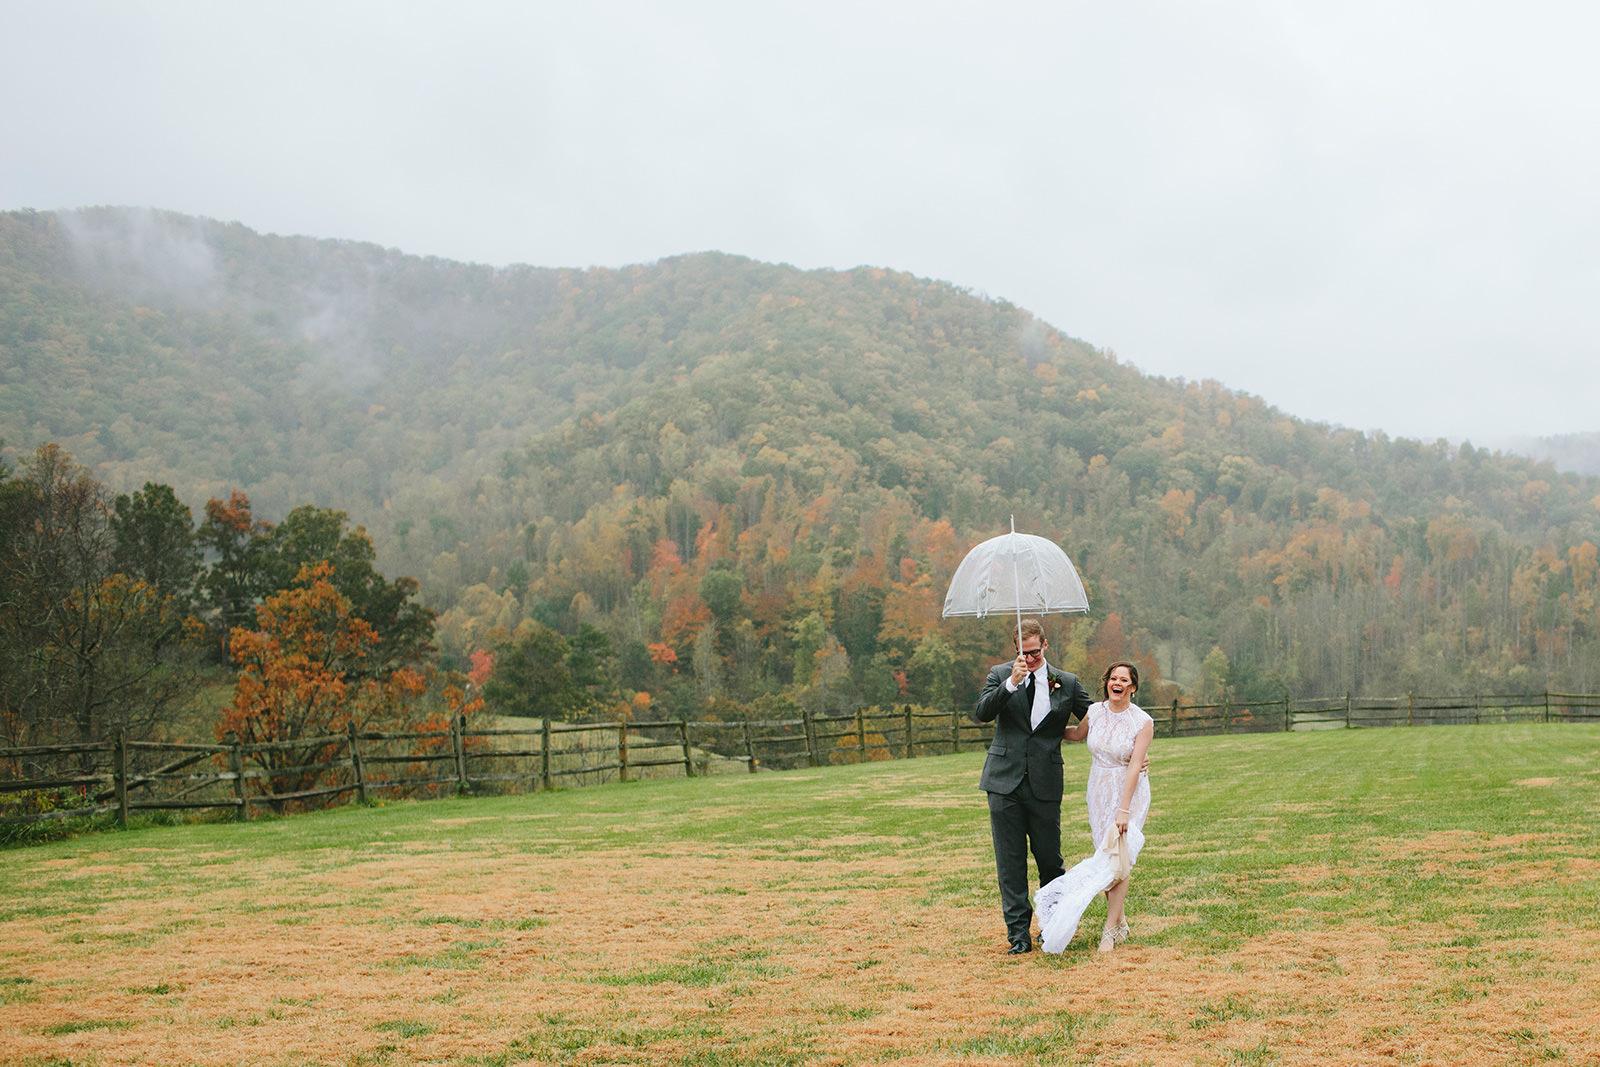 morningwild-claxton-farm-wedding-photos-01